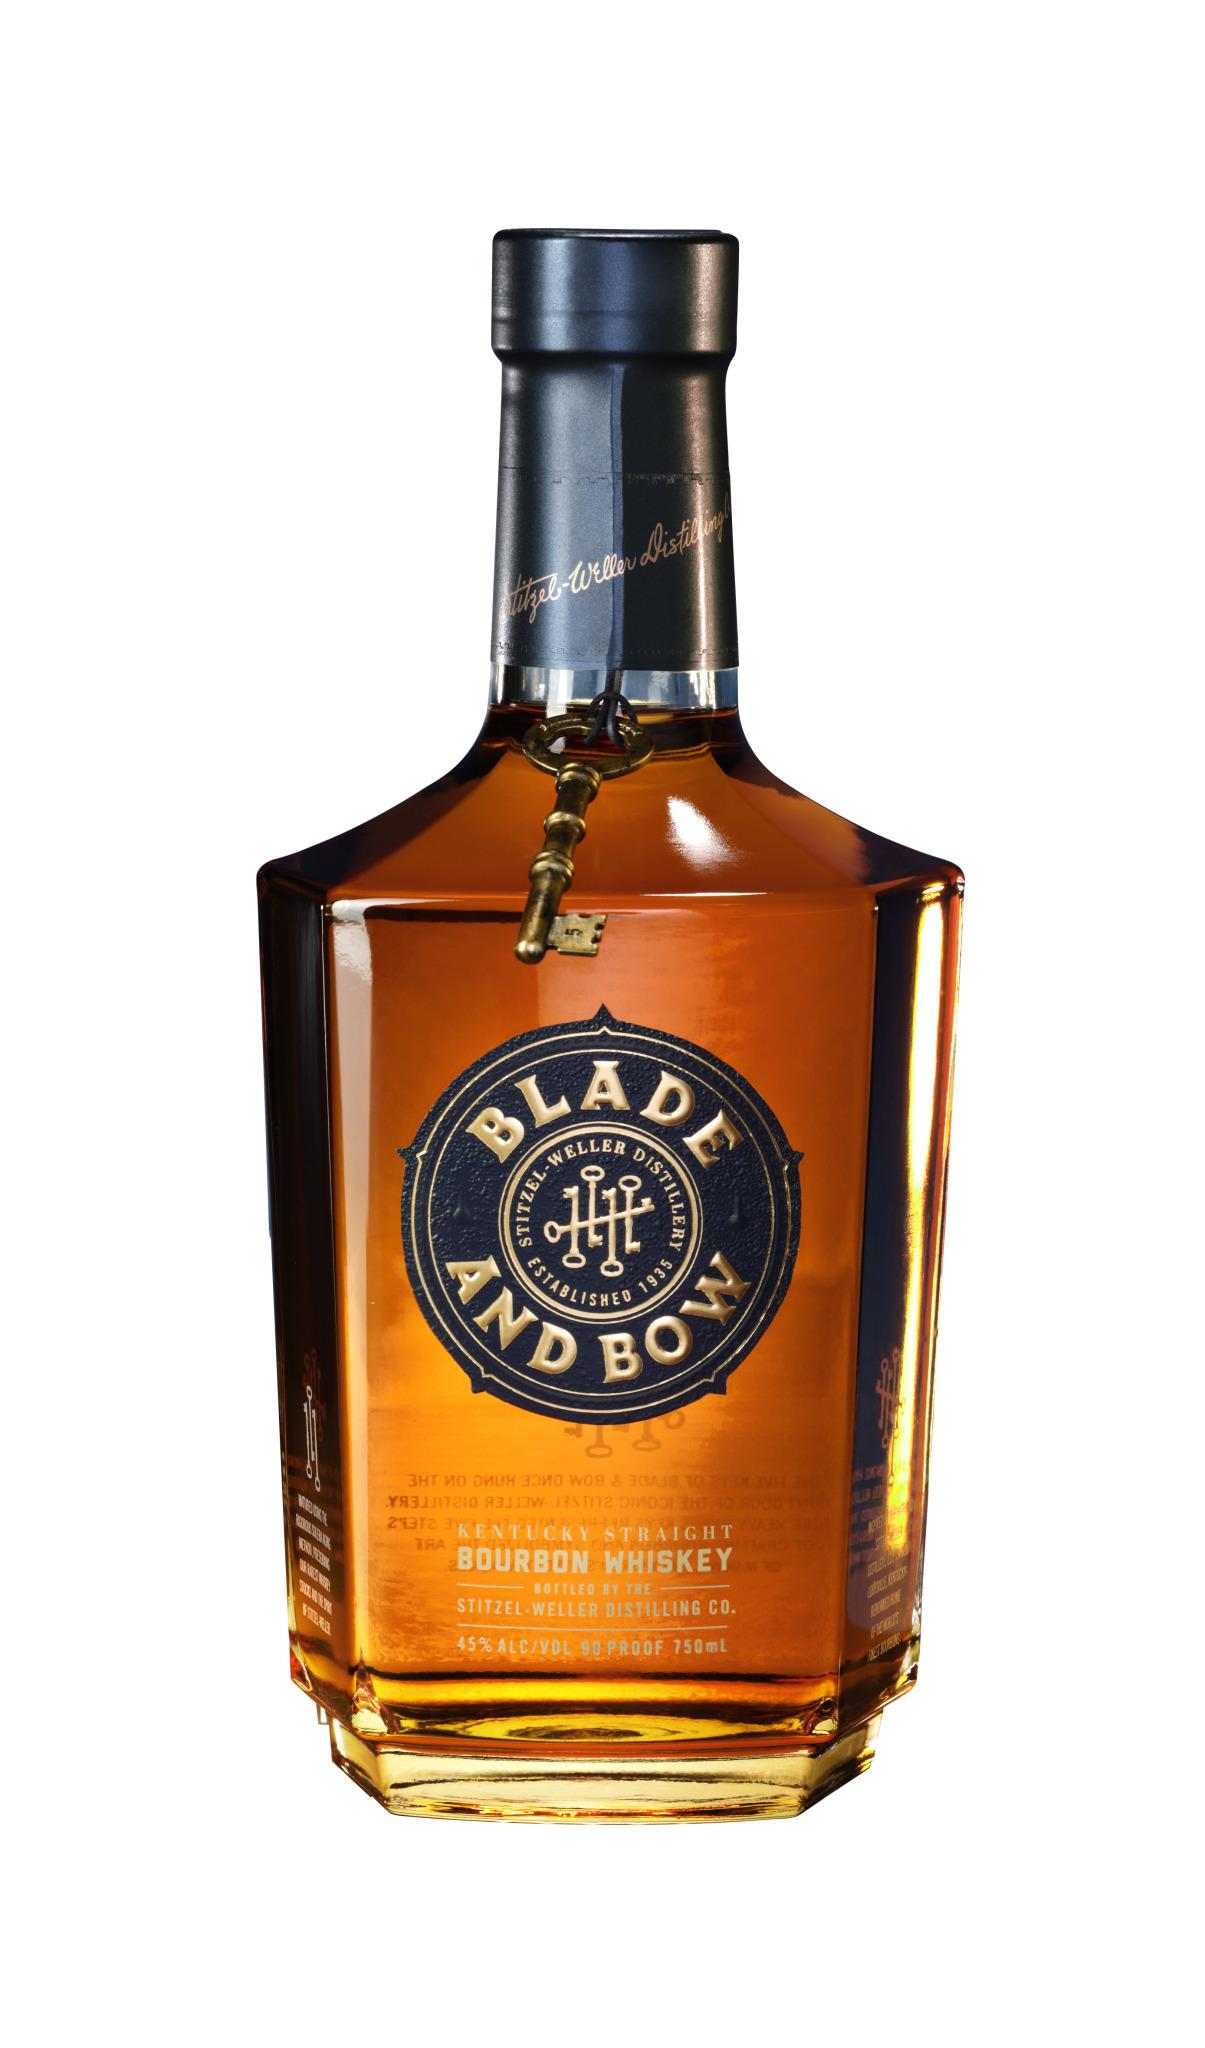 Blade and Bow Kentucky Straight Bourbon